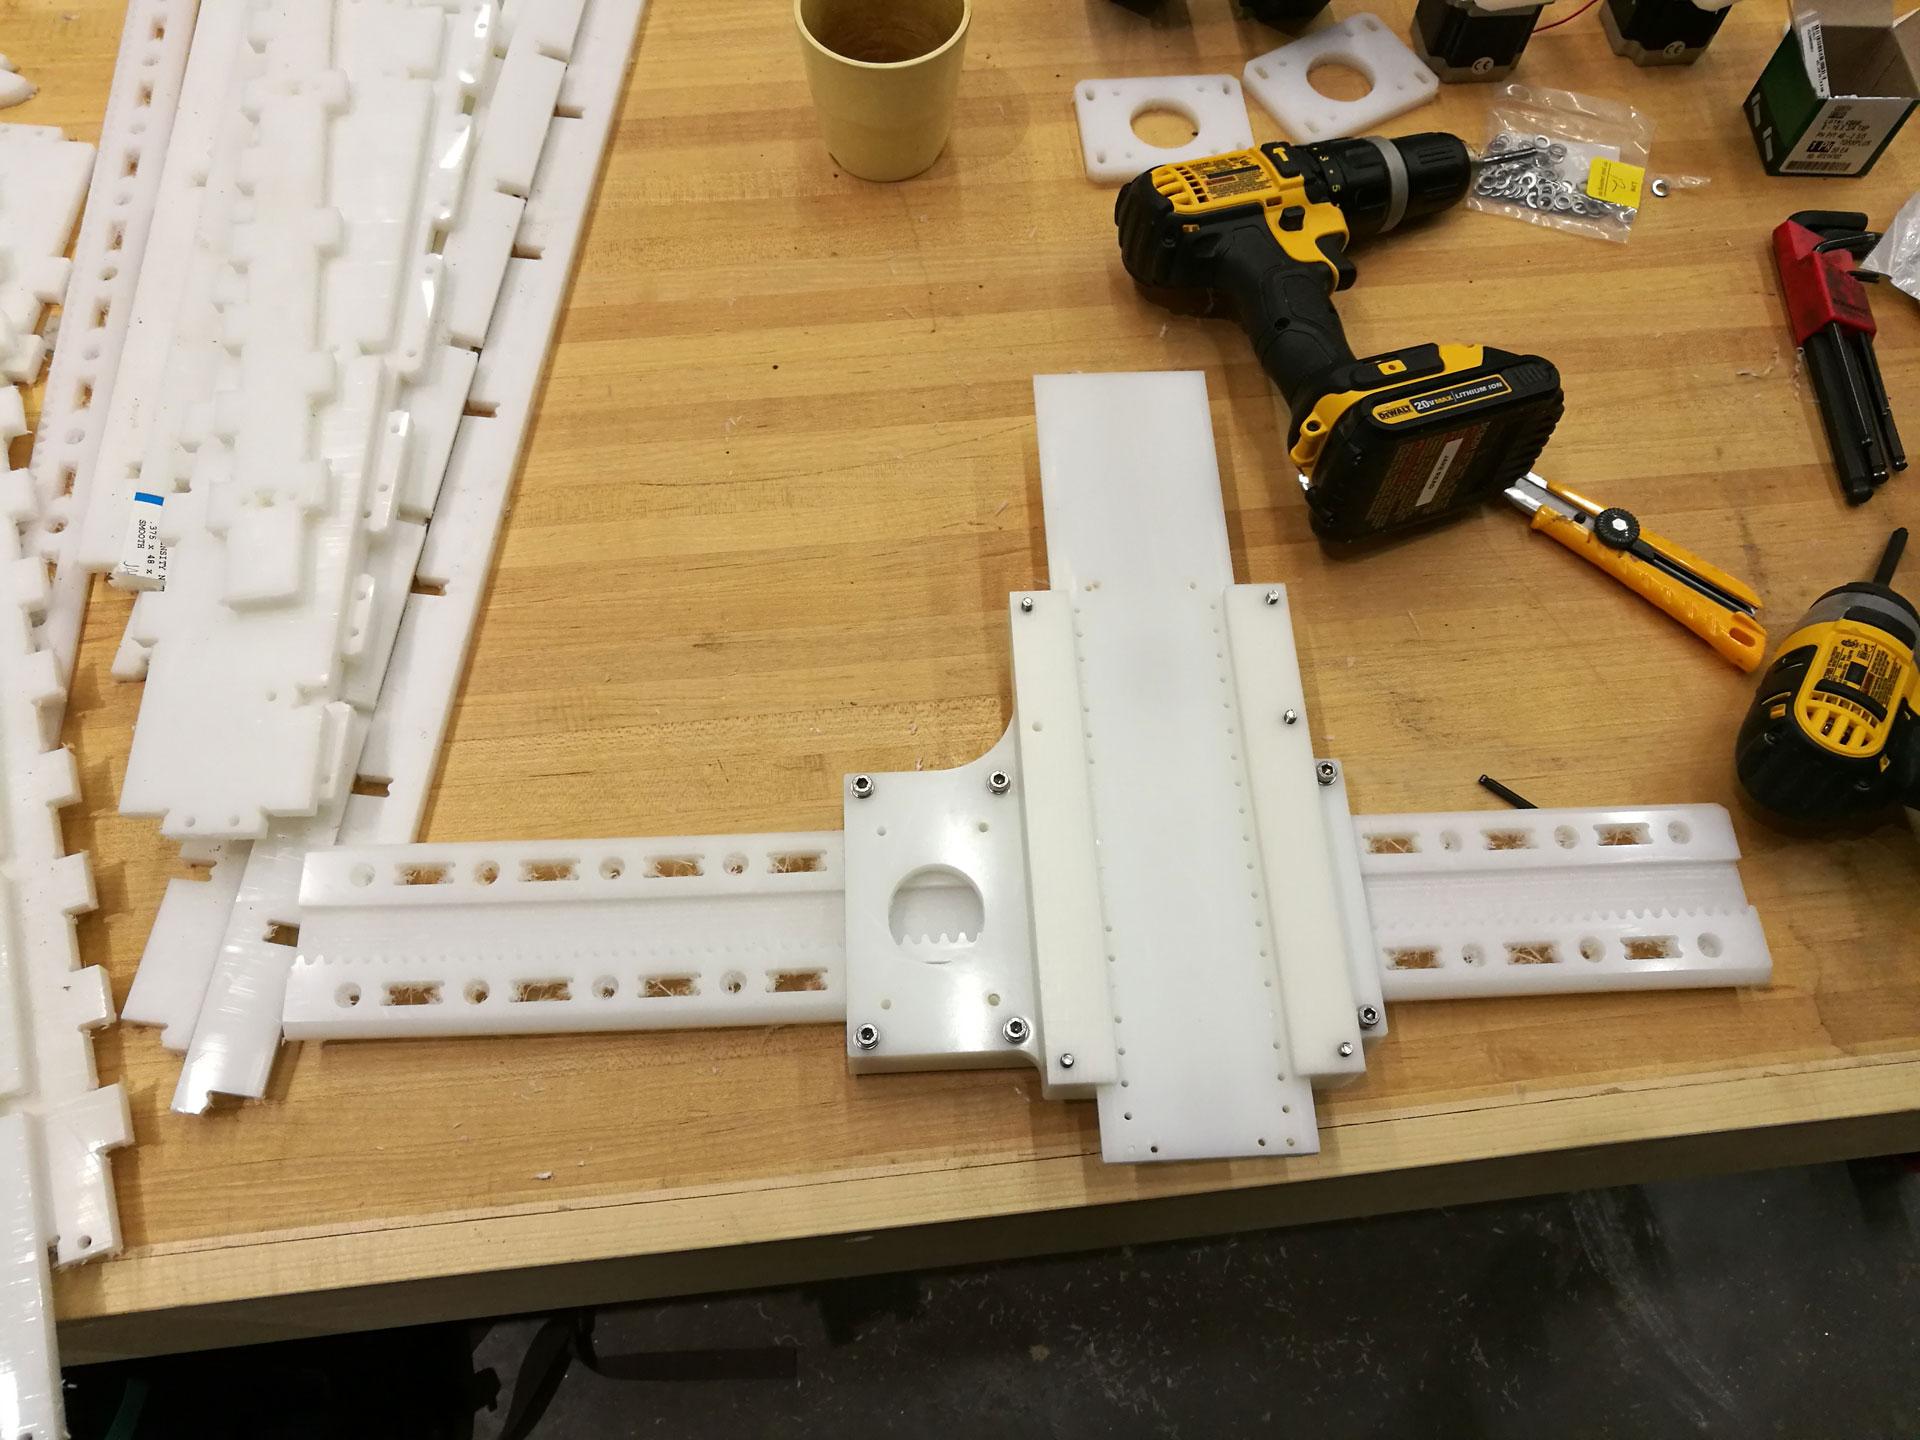 images/assembly-xz-no-motors.jpg